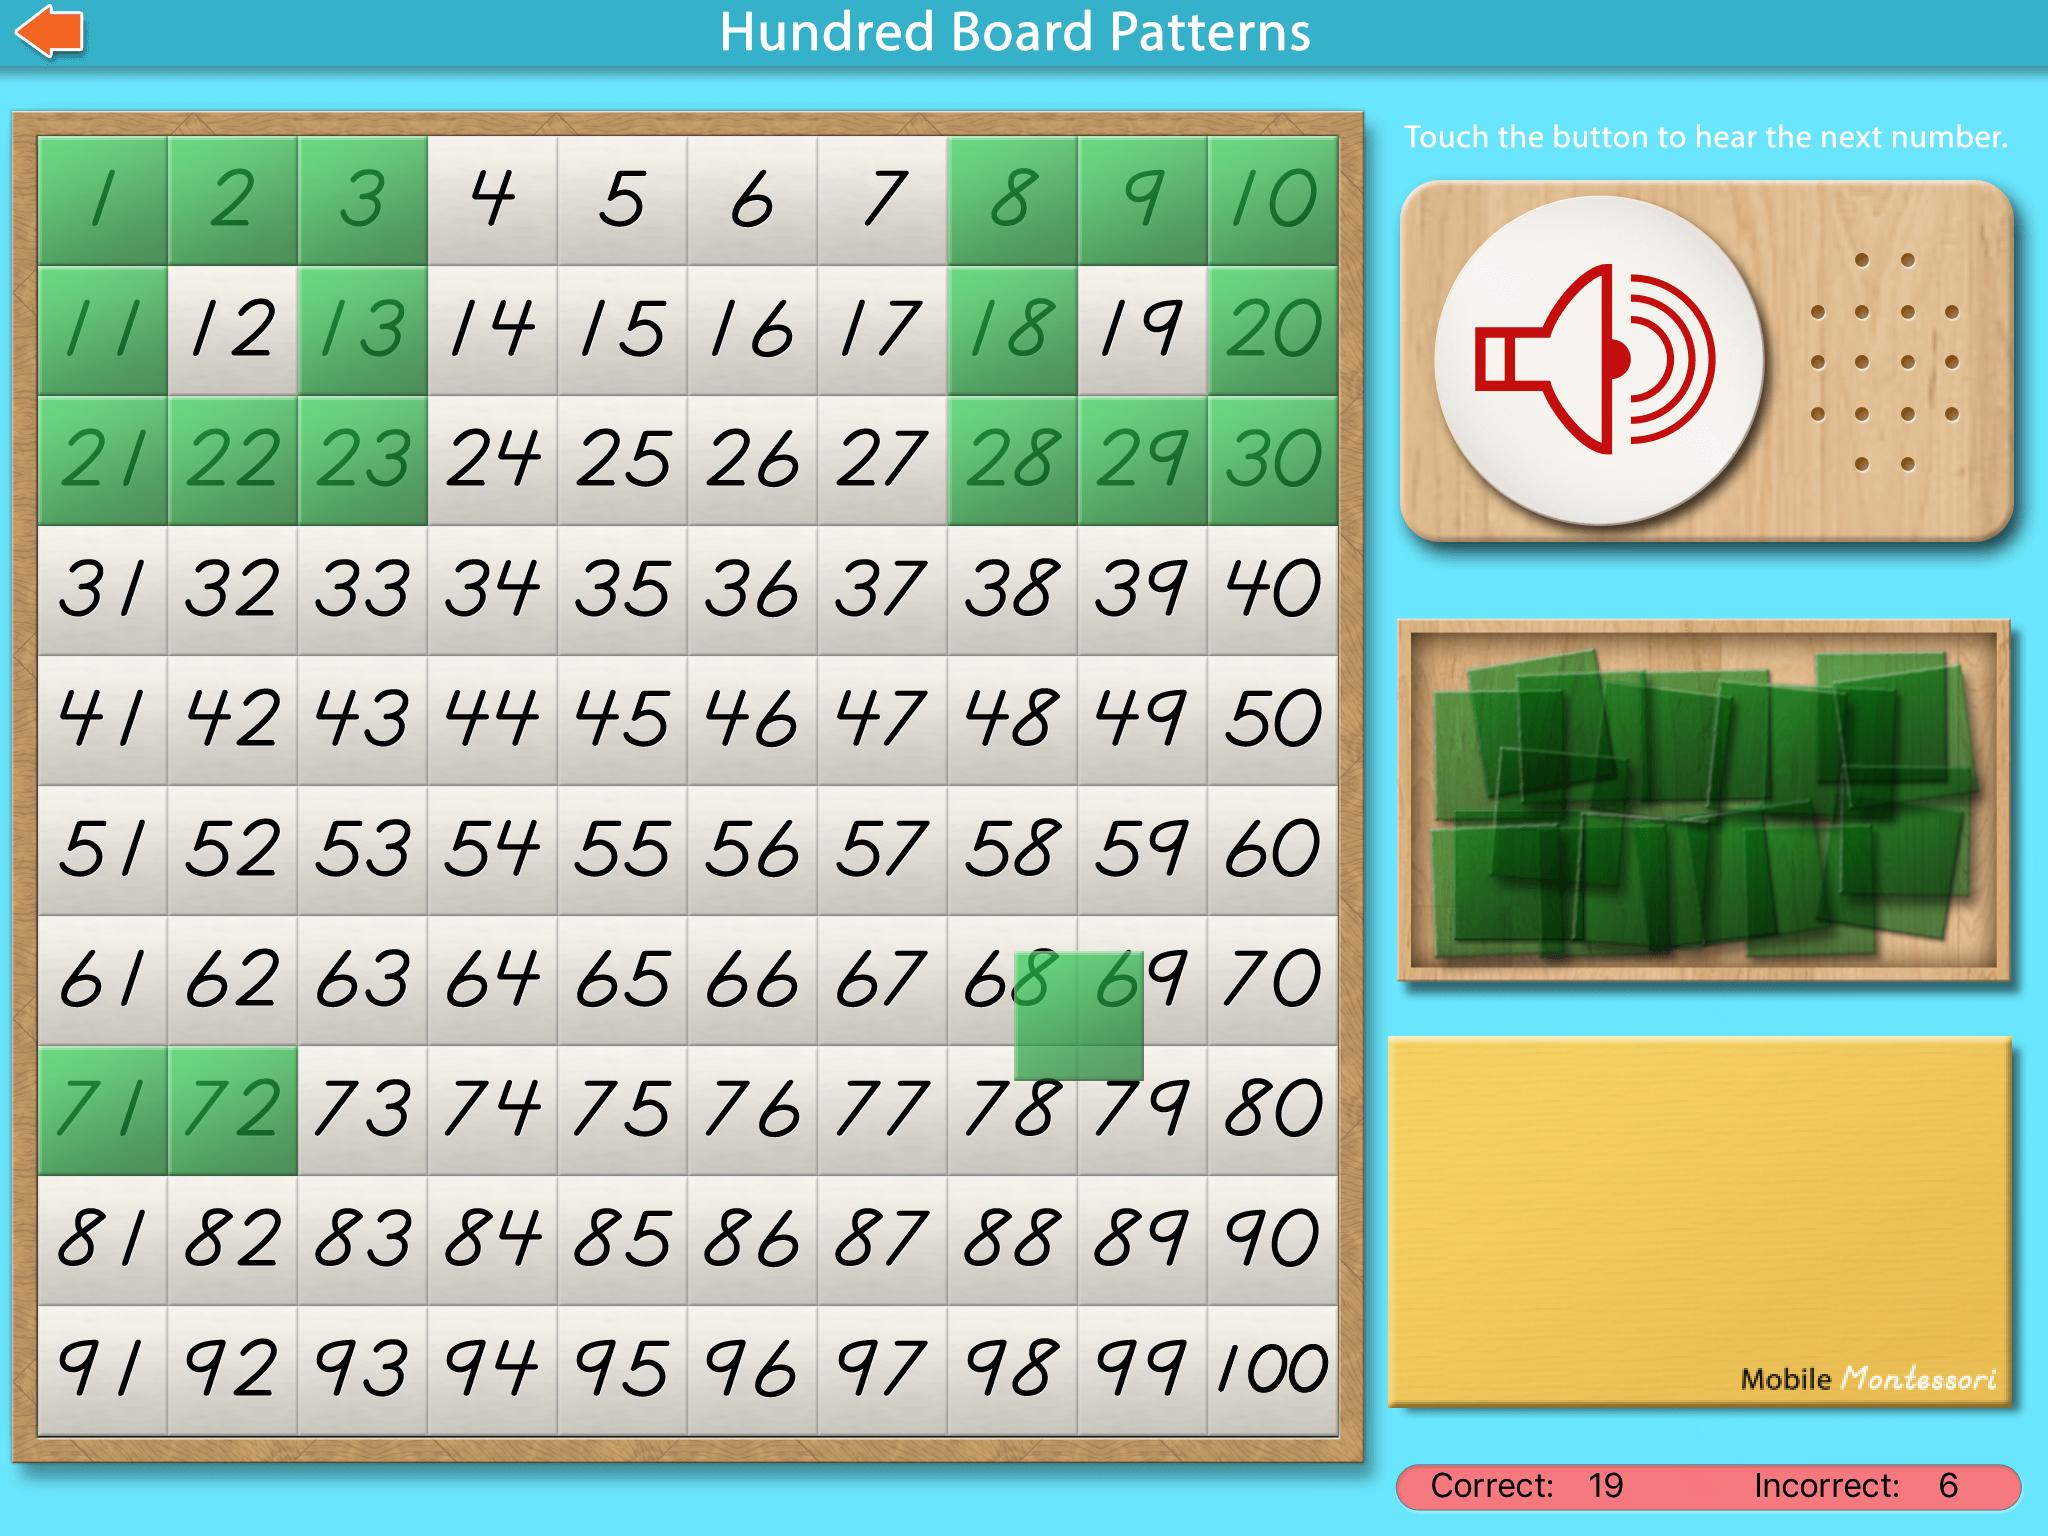 HundredBoardPatternsSC3-reg.png